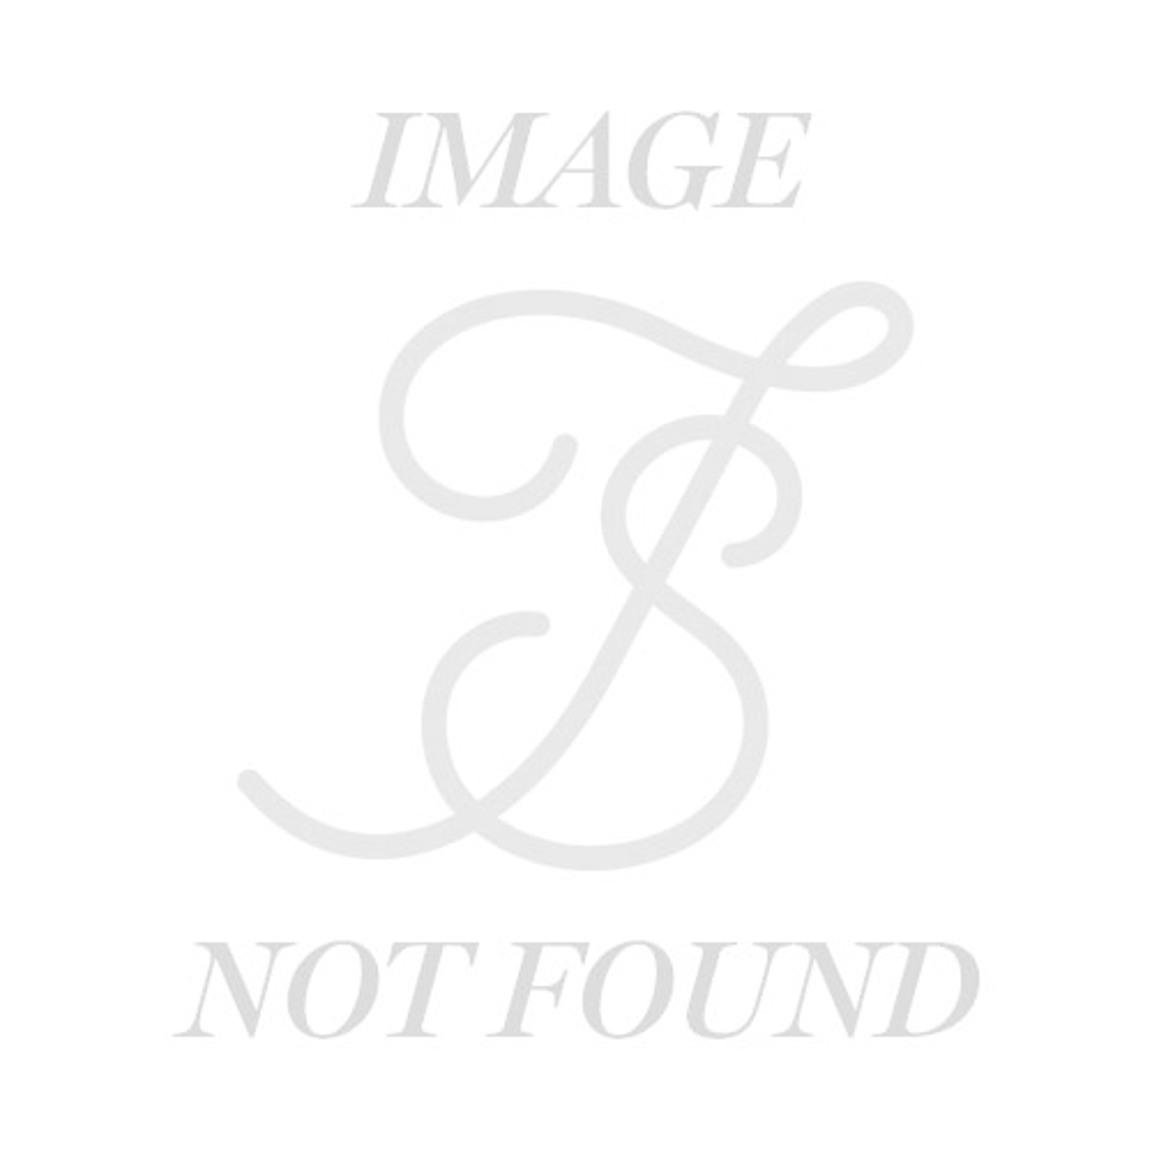 Asbury, blue